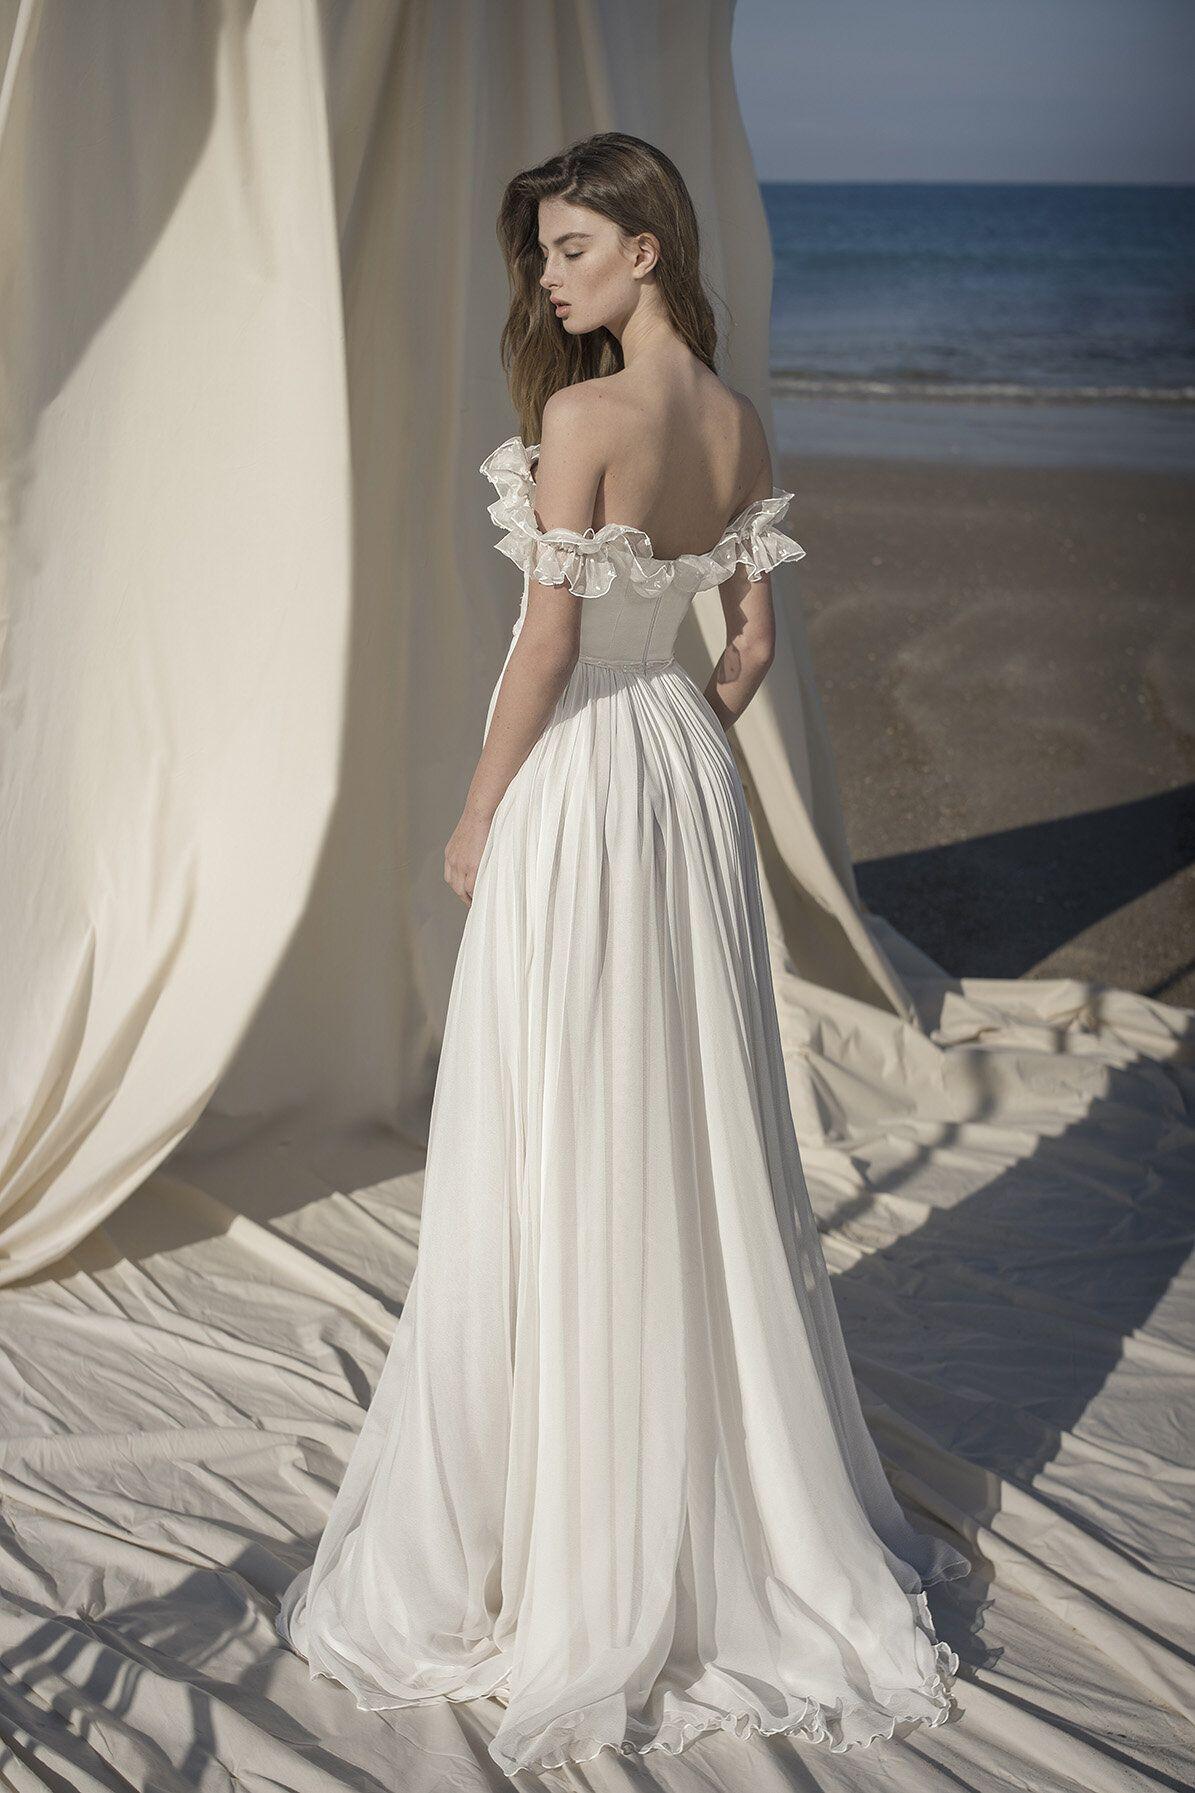 Marine Wedding Dress — Alon Livné White in 2020 Marine